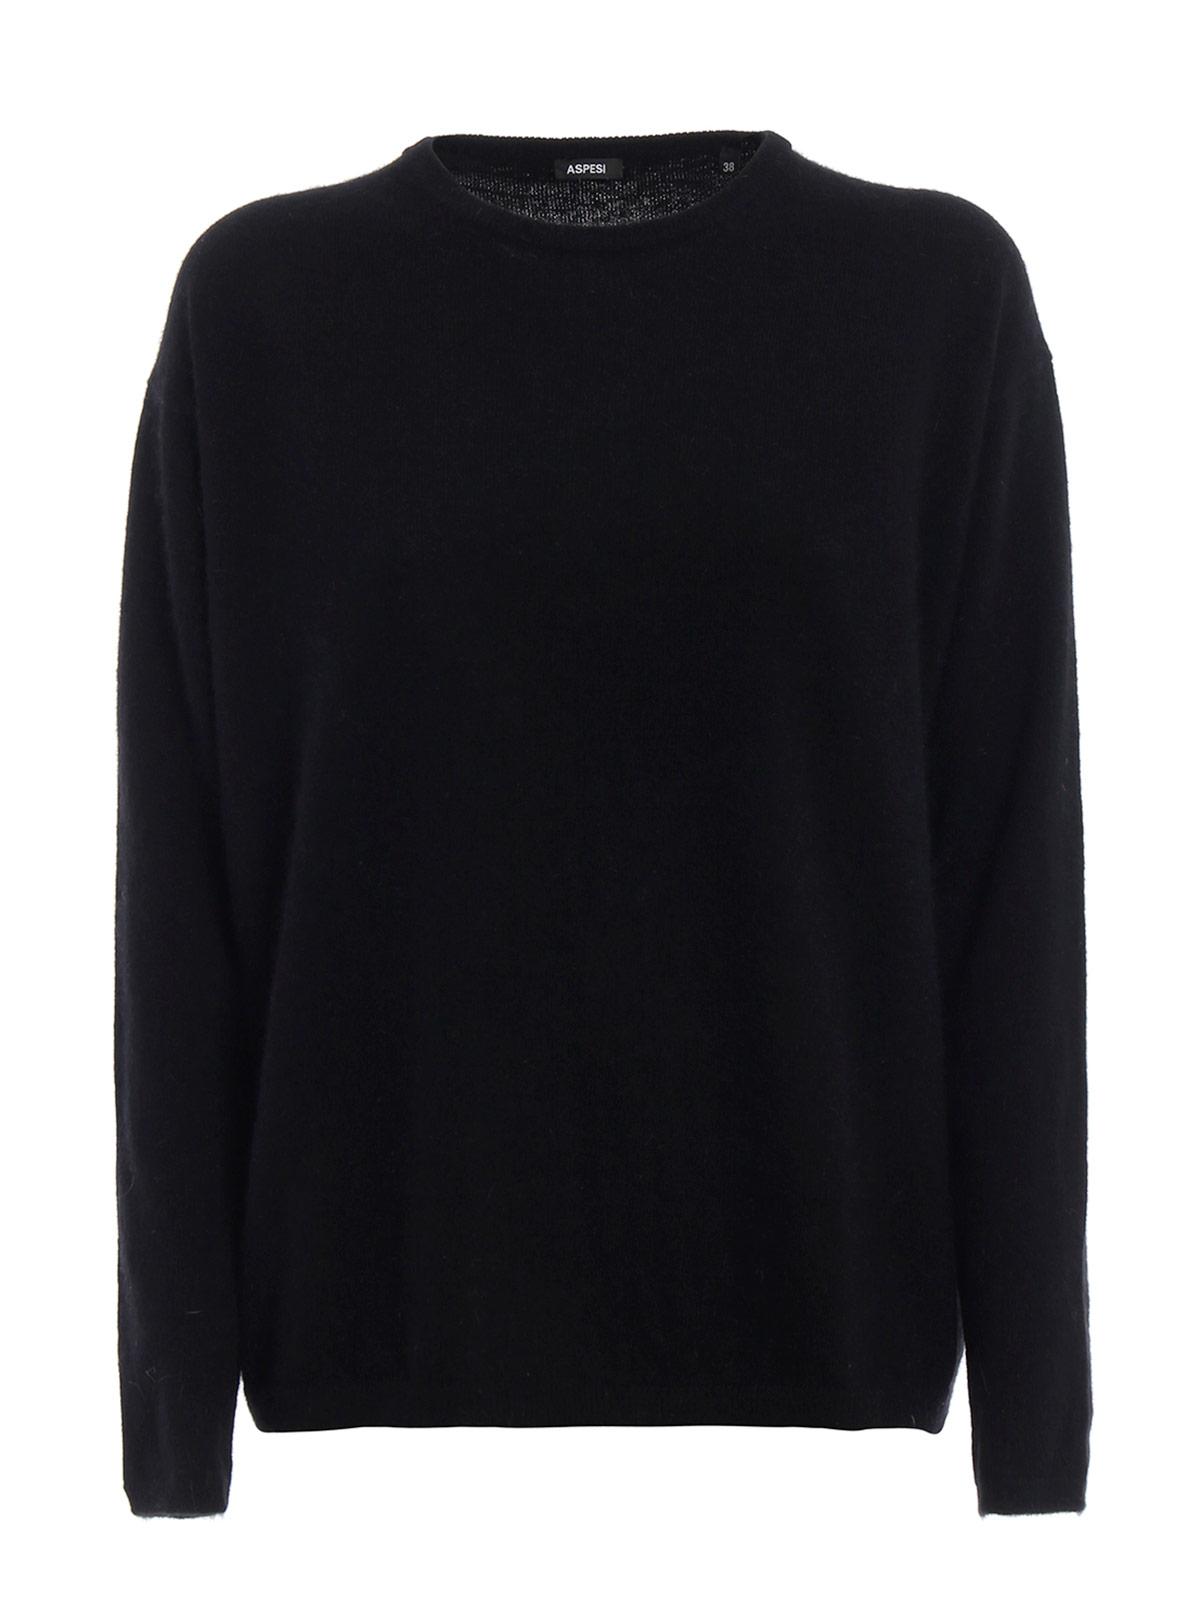 Picture of ASPESI | Women's Wool and Angora Sweater